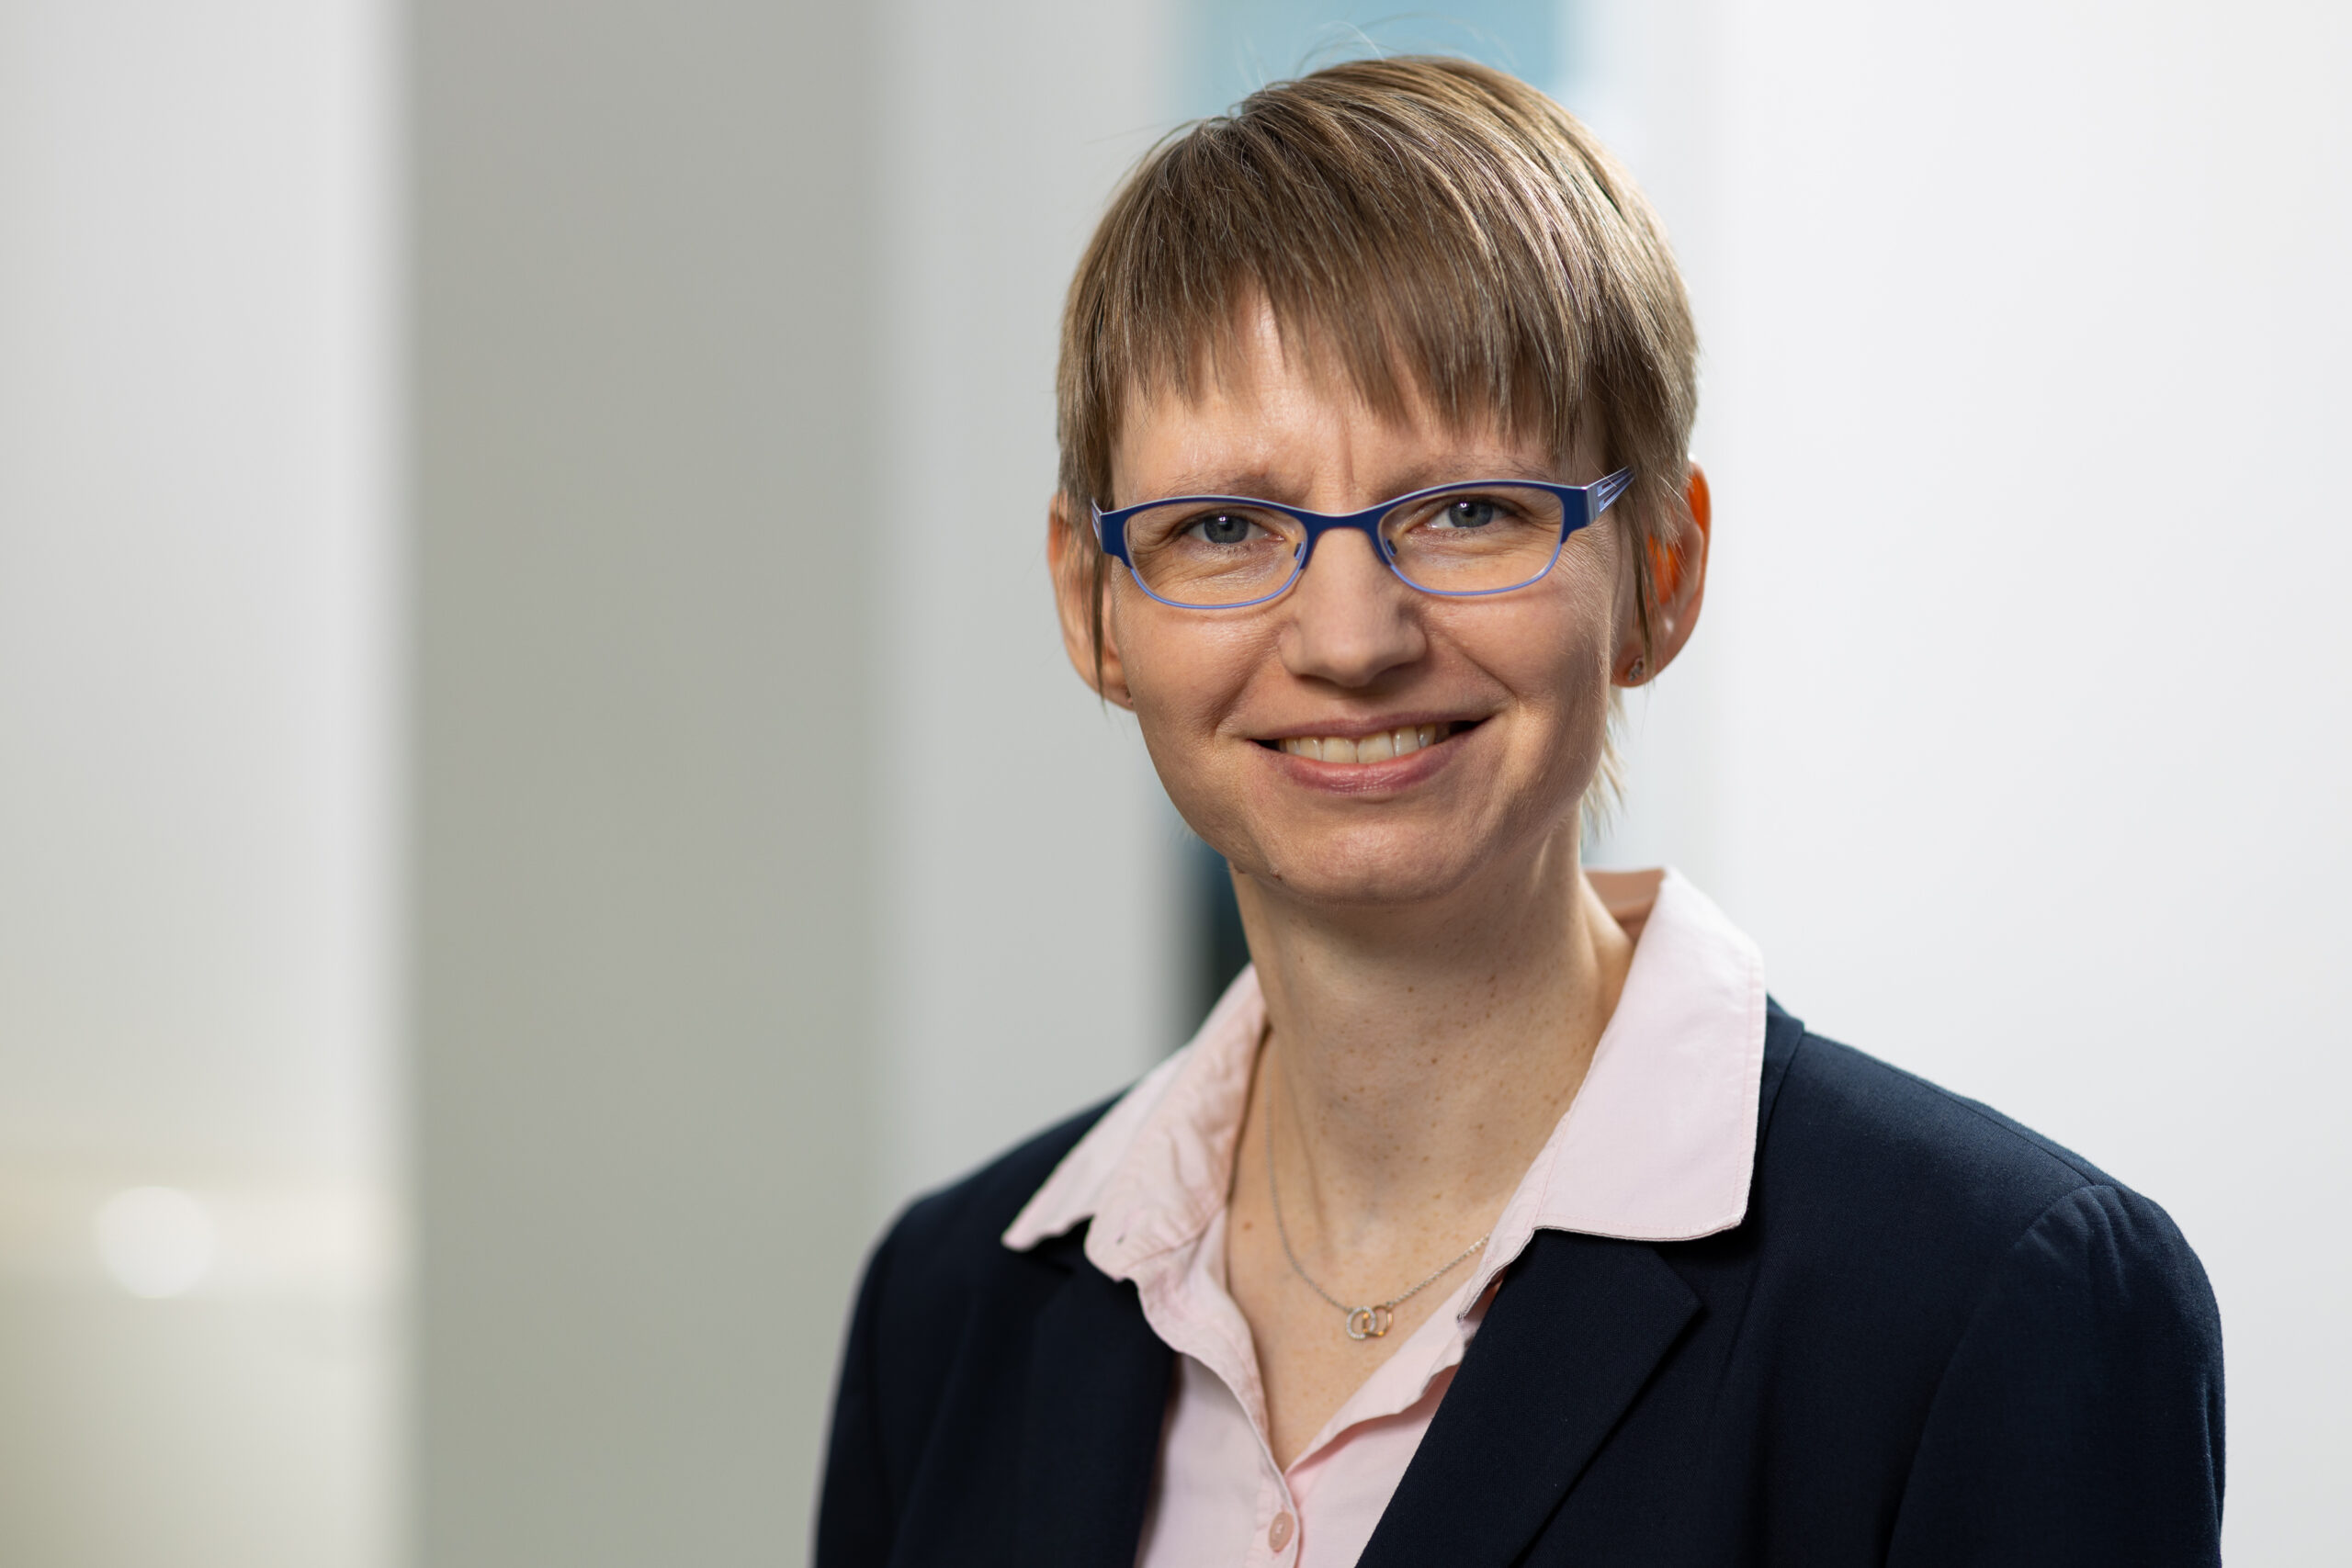 Dr. Nicole Plohnke